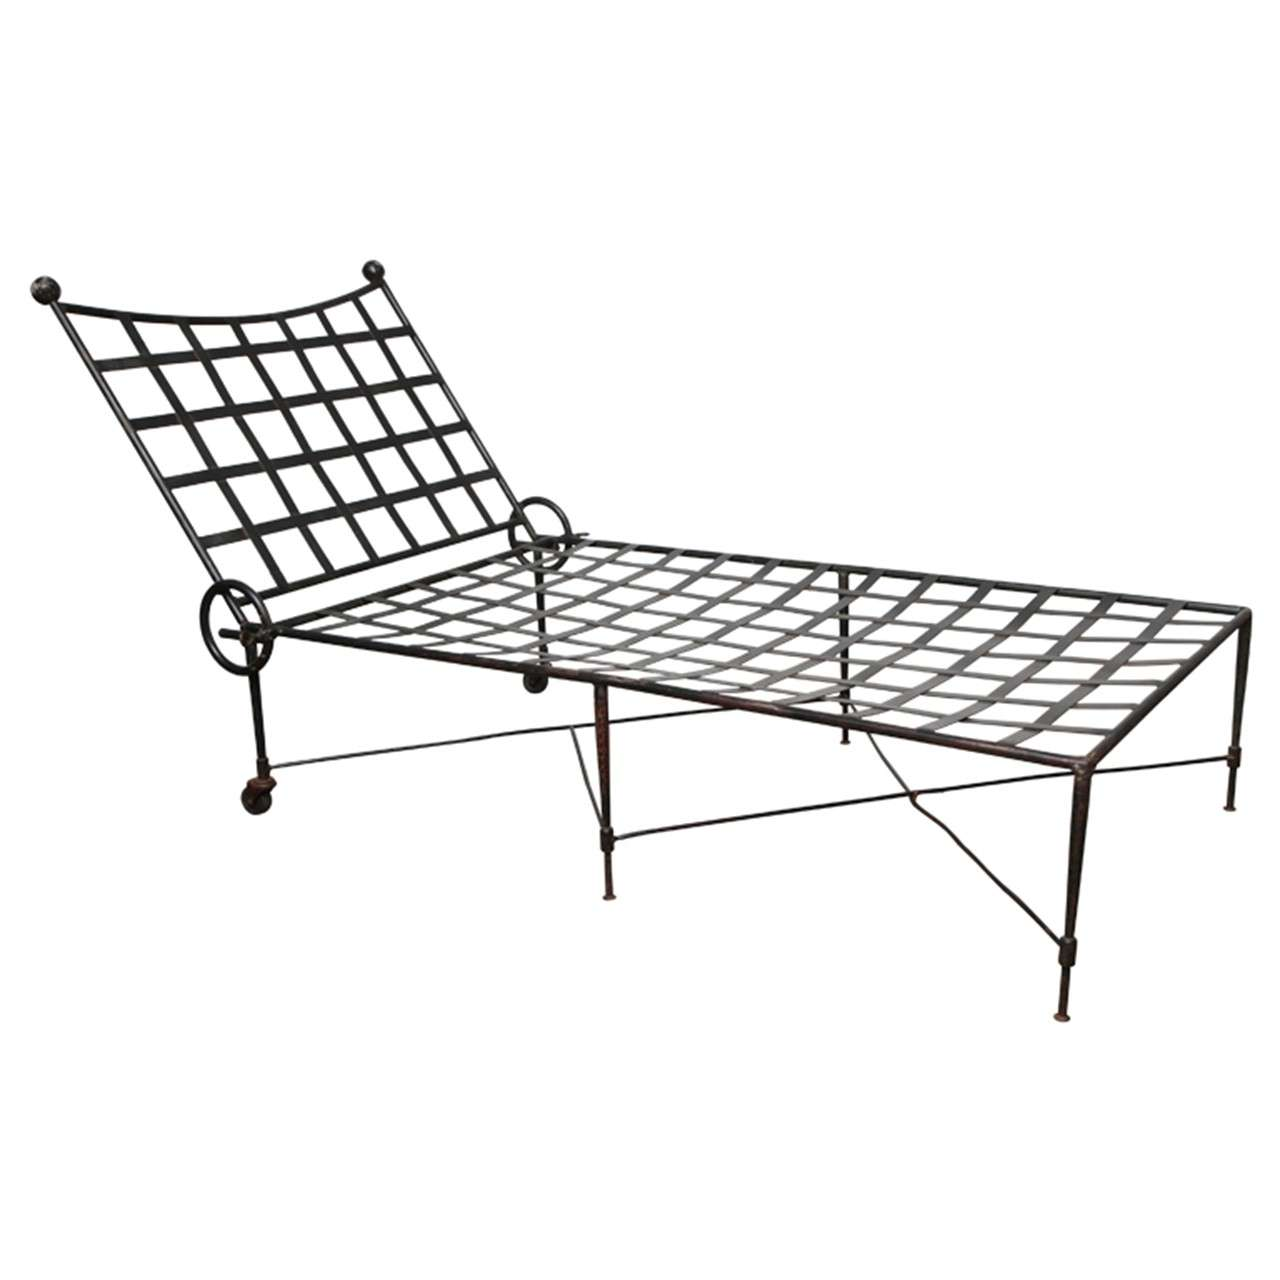 italian chaise longue at 1stdibs. Black Bedroom Furniture Sets. Home Design Ideas